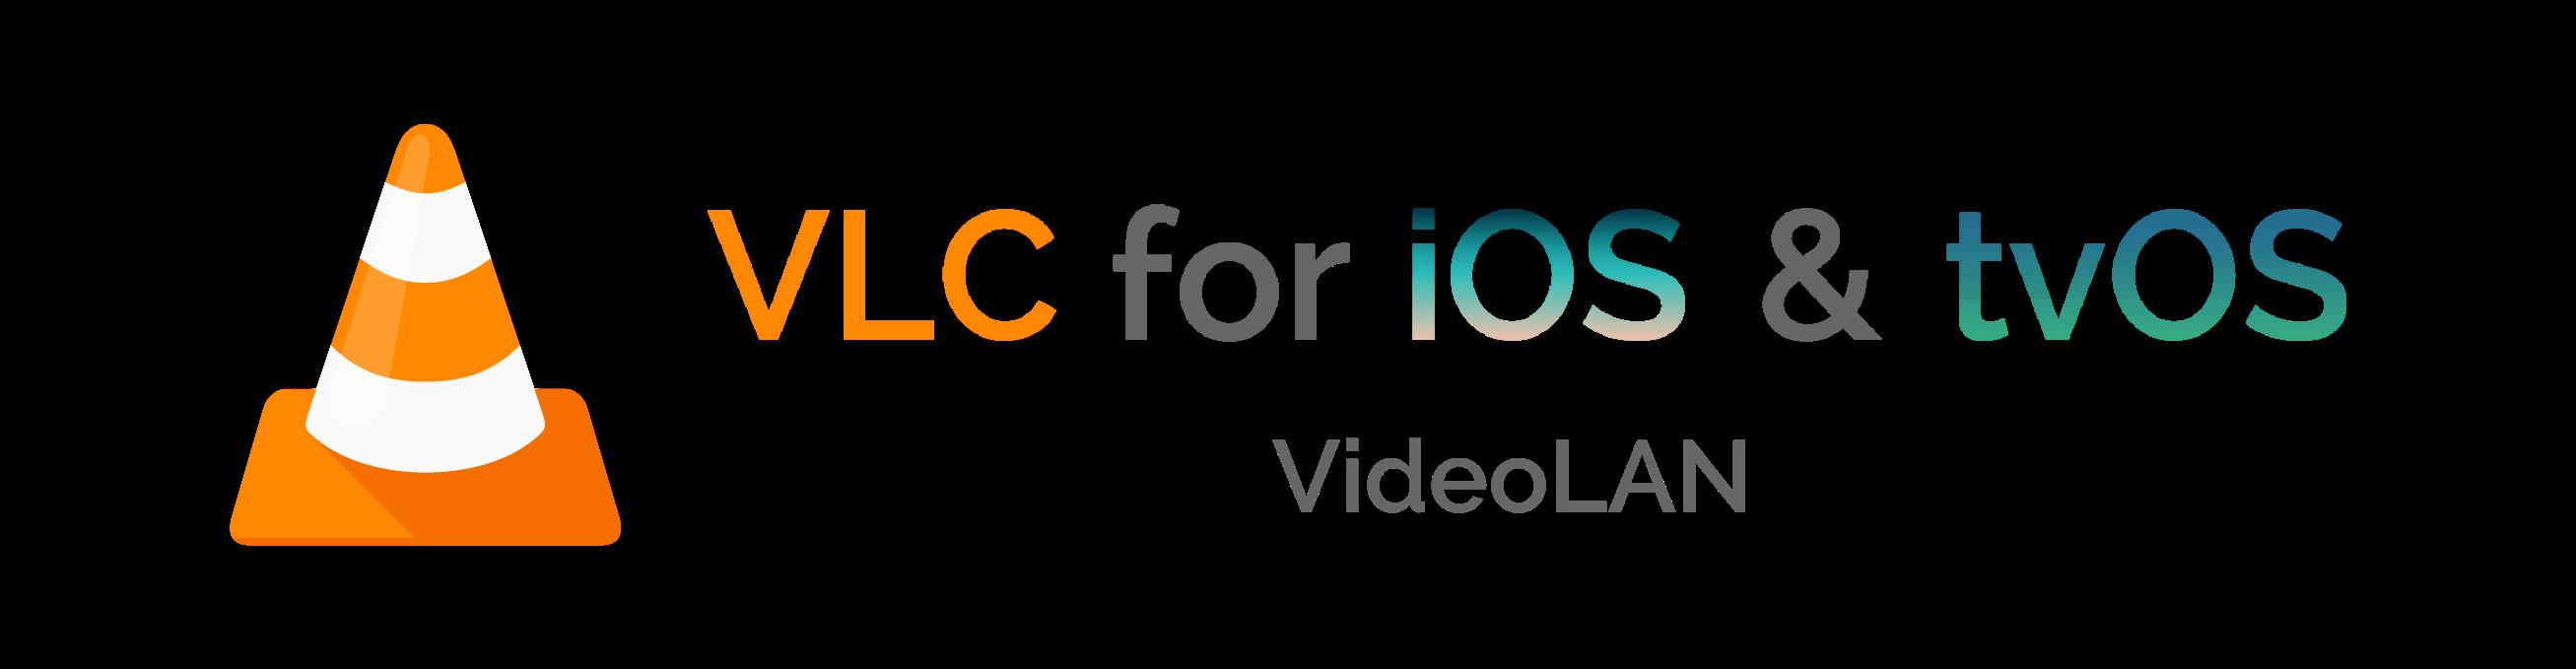 GitHub - videolan/vlc-ios: VLC for iOS and tvOS official mirror